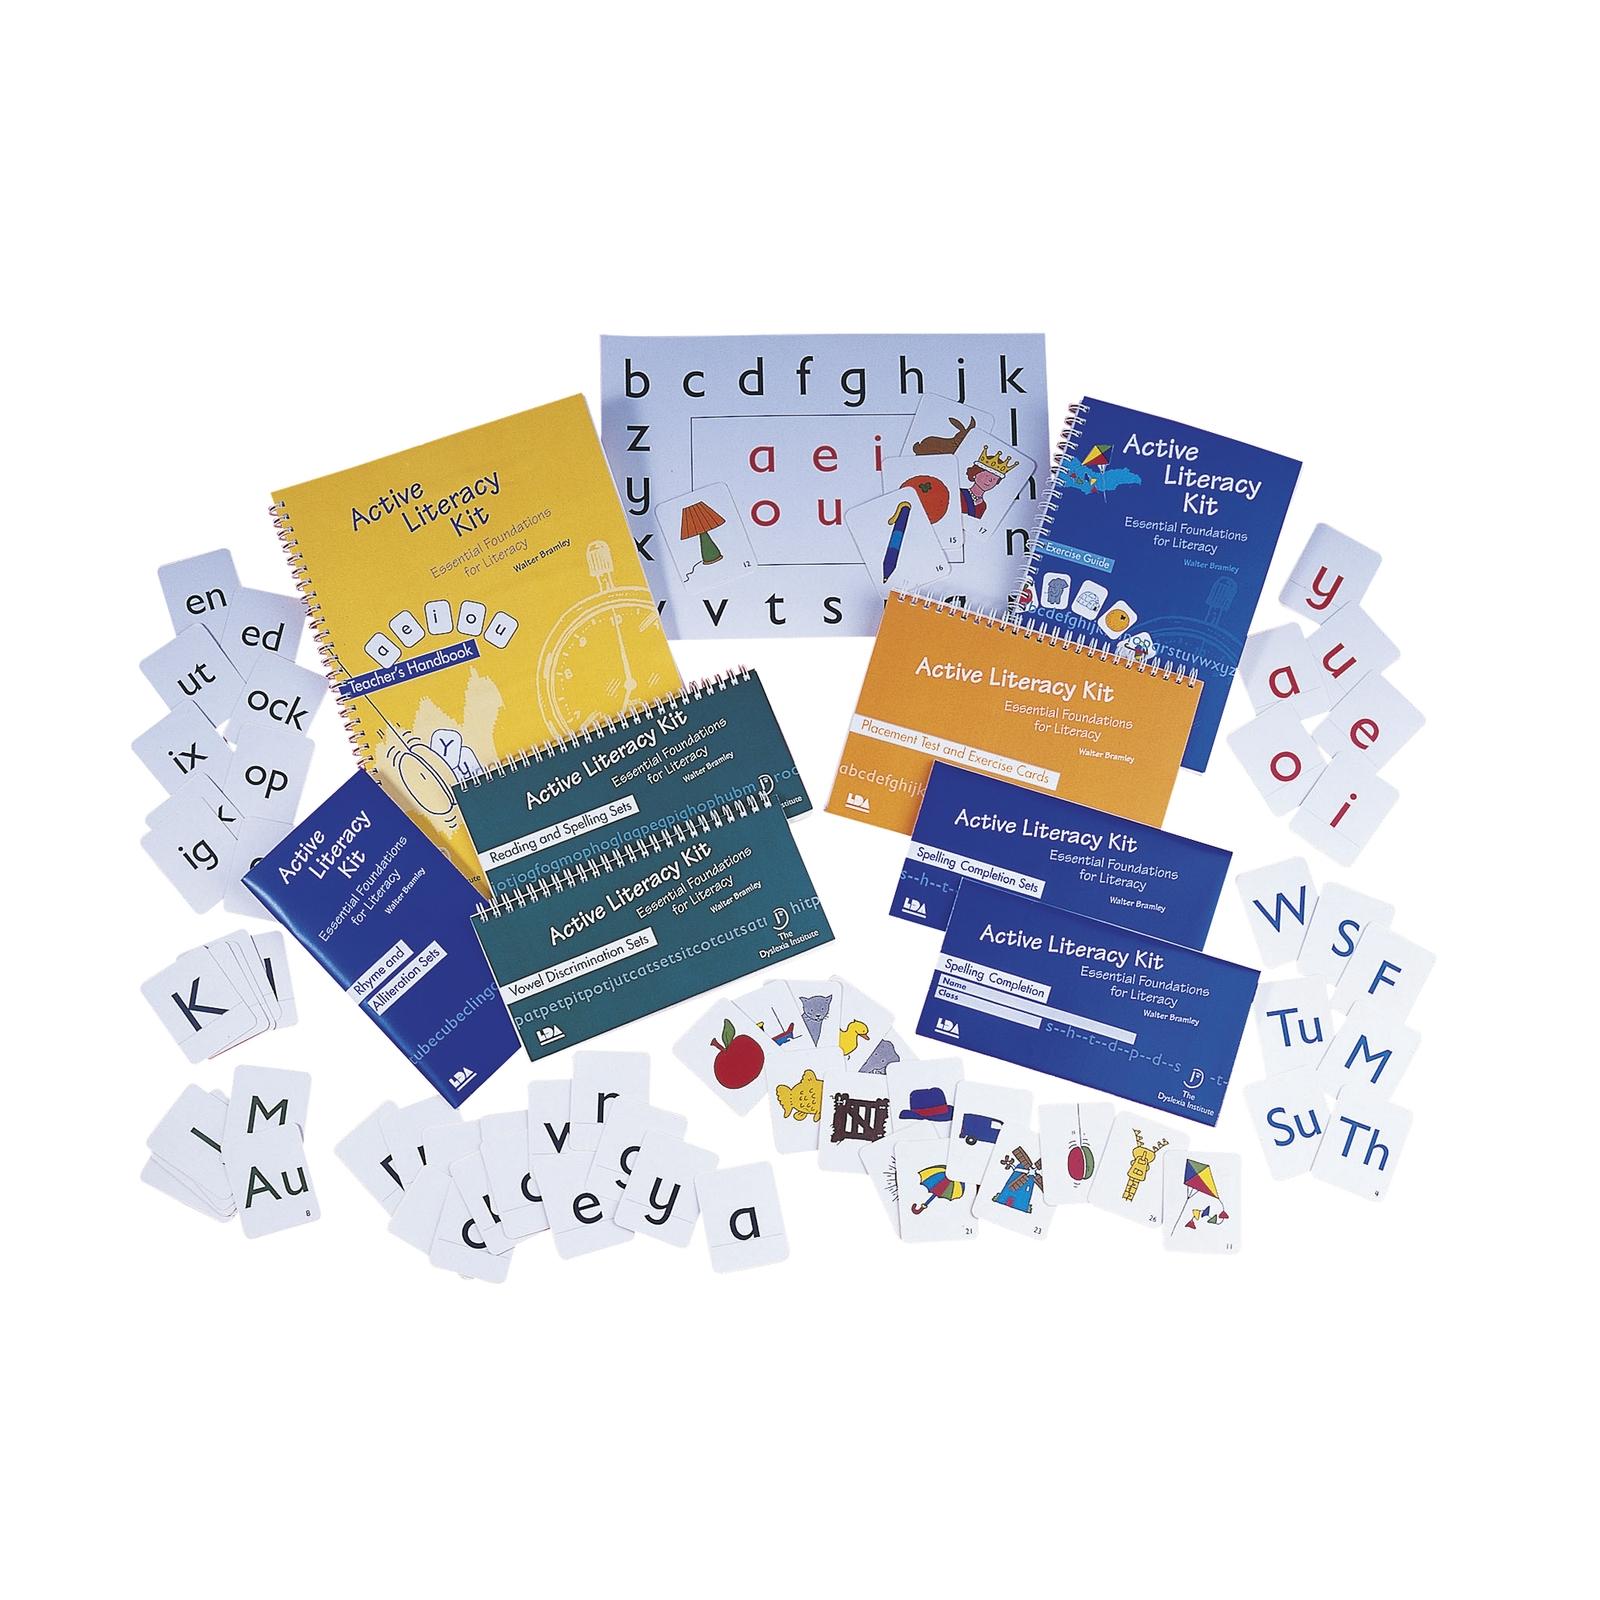 Active Literacy Kit